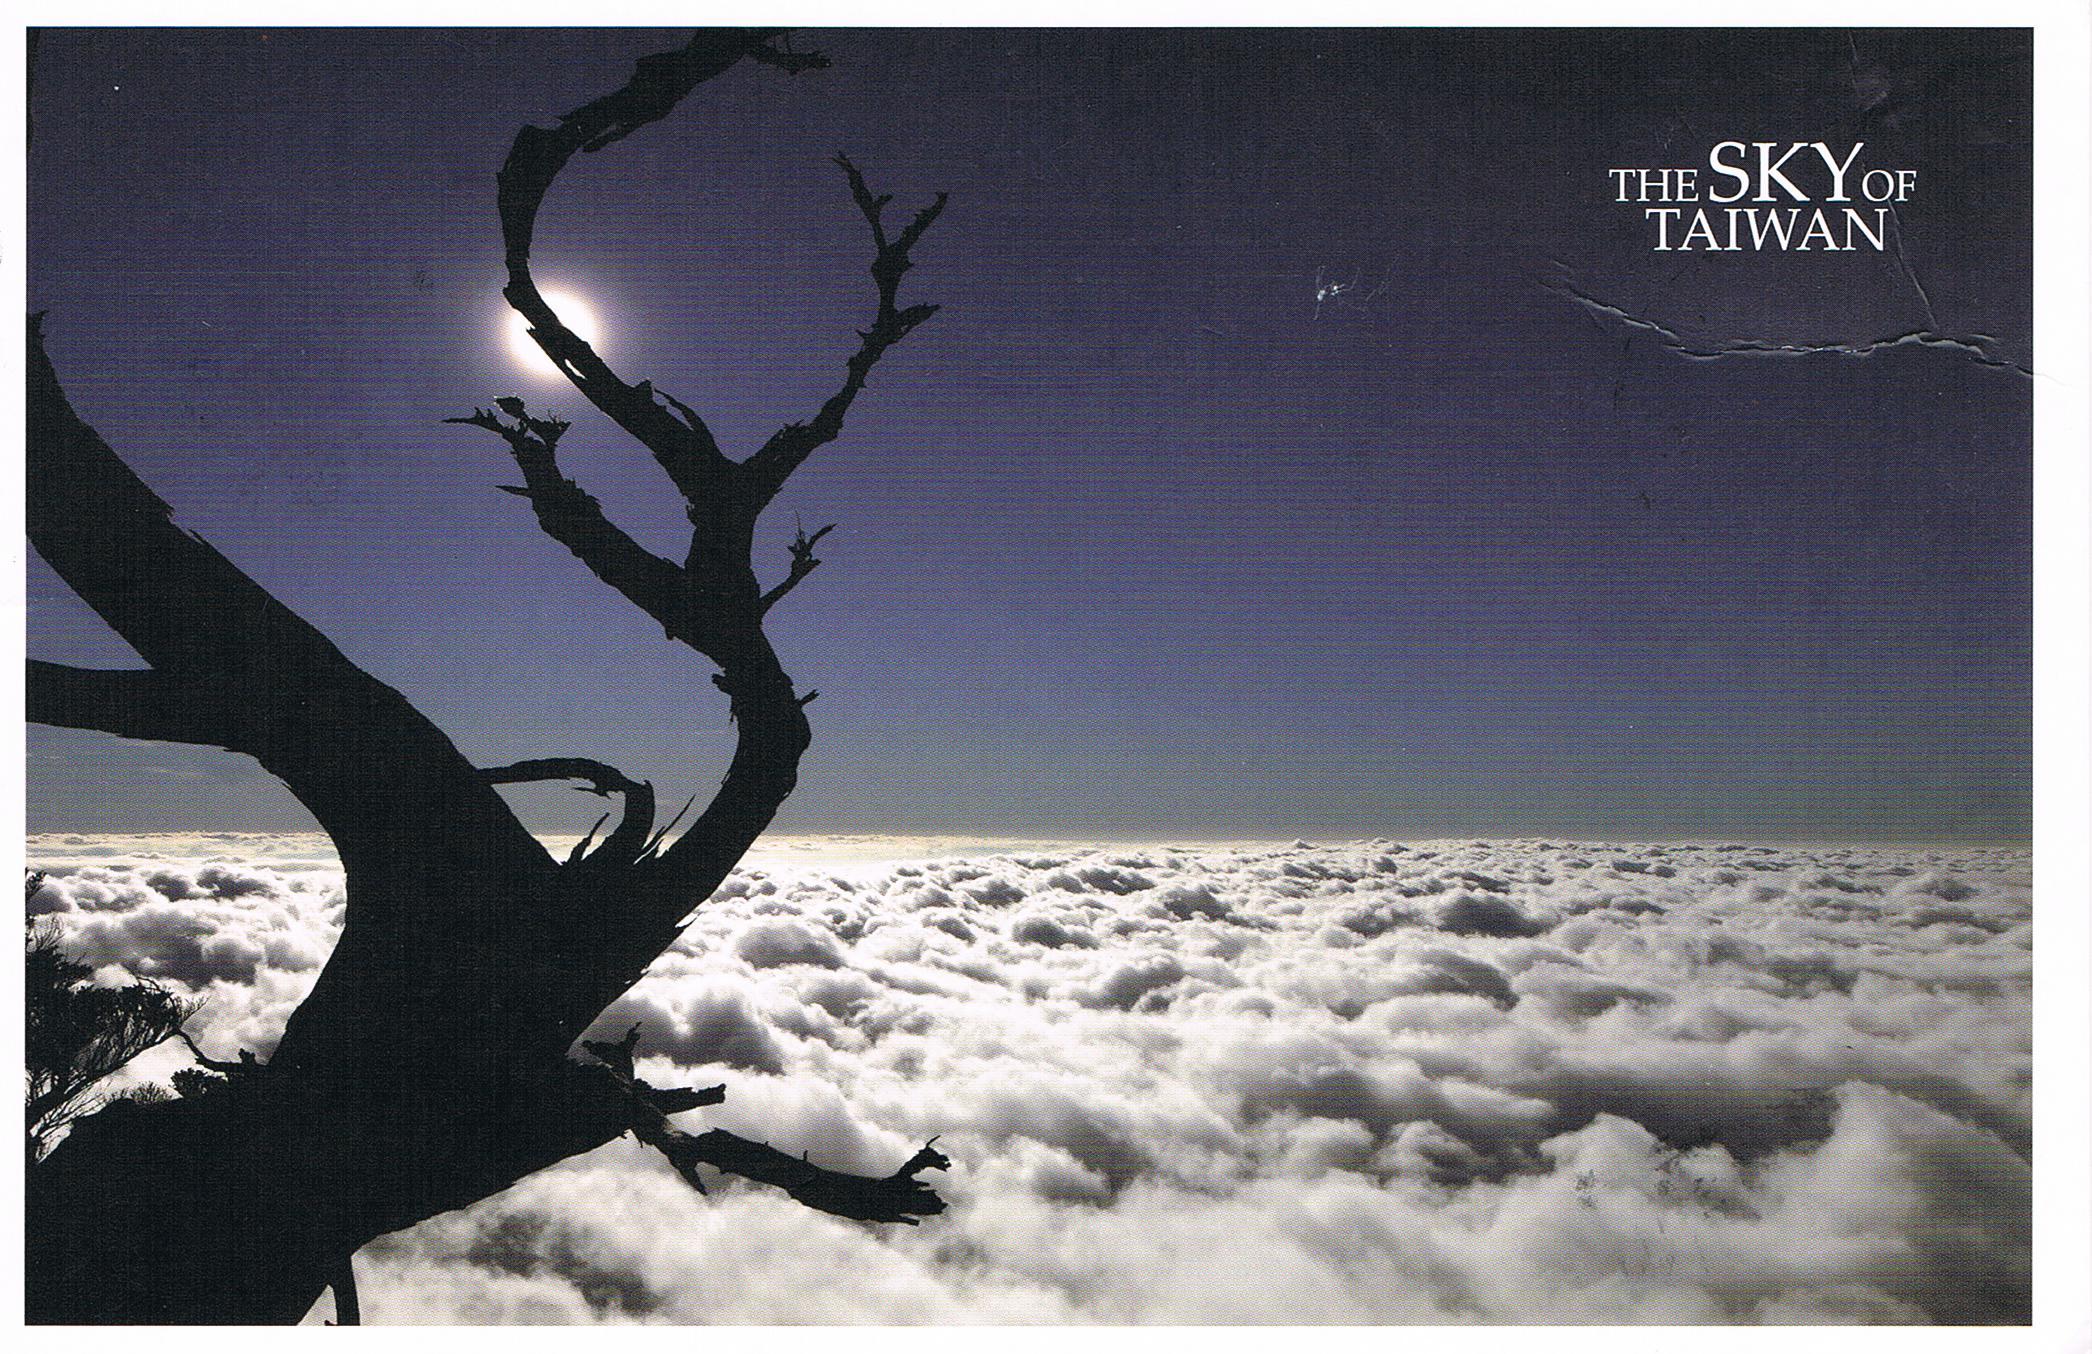 The Sky of Taiwan